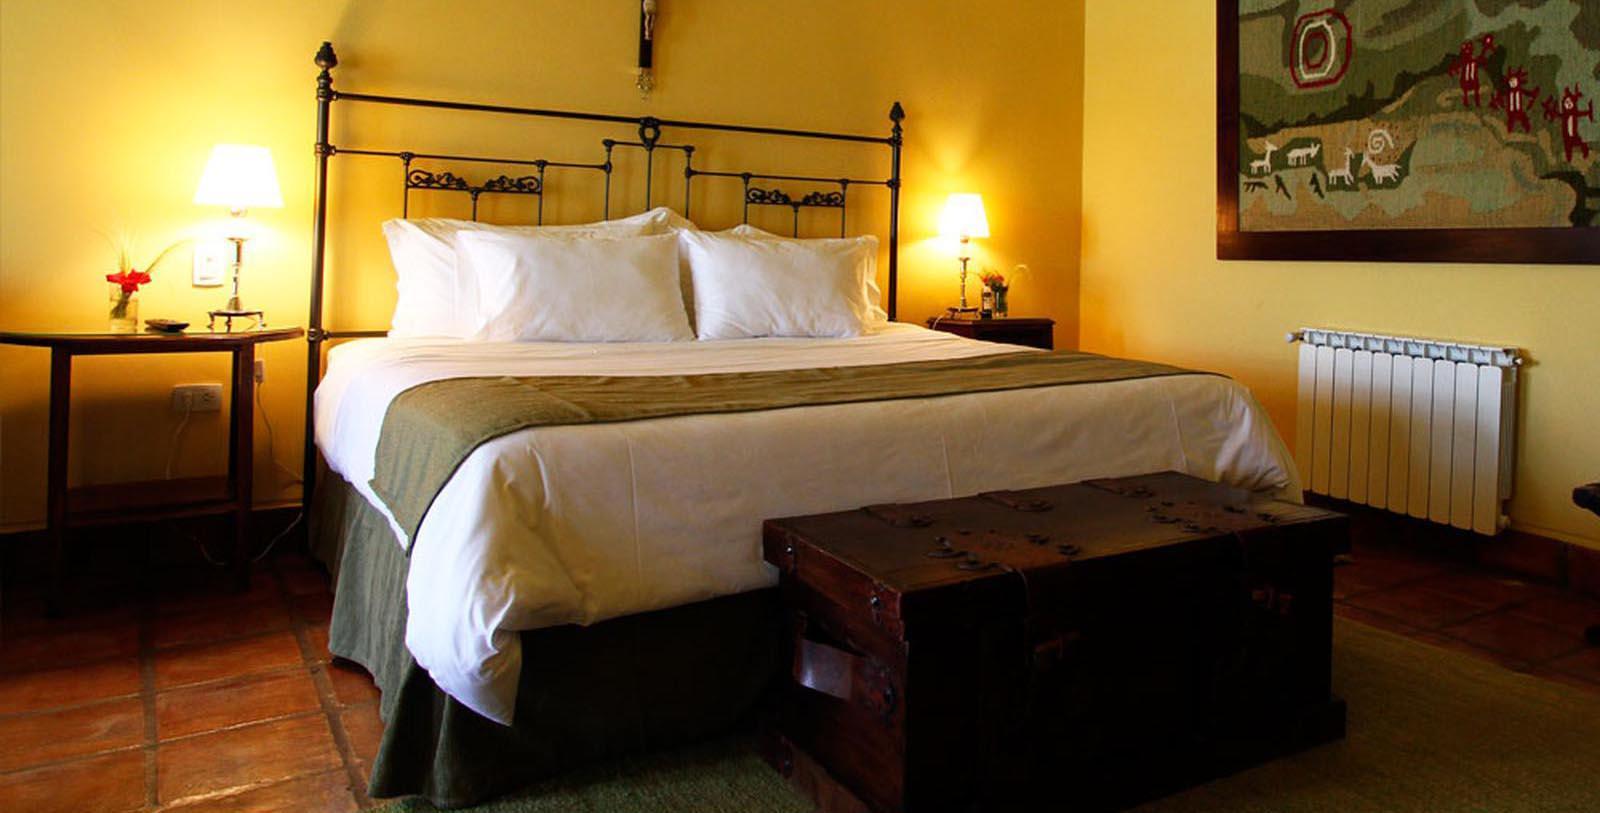 Image of Guestroom Interior Patios de Cafayate, 1740, Member of Historic Hotels Worldwide, in Cafayate, Argentina, Location